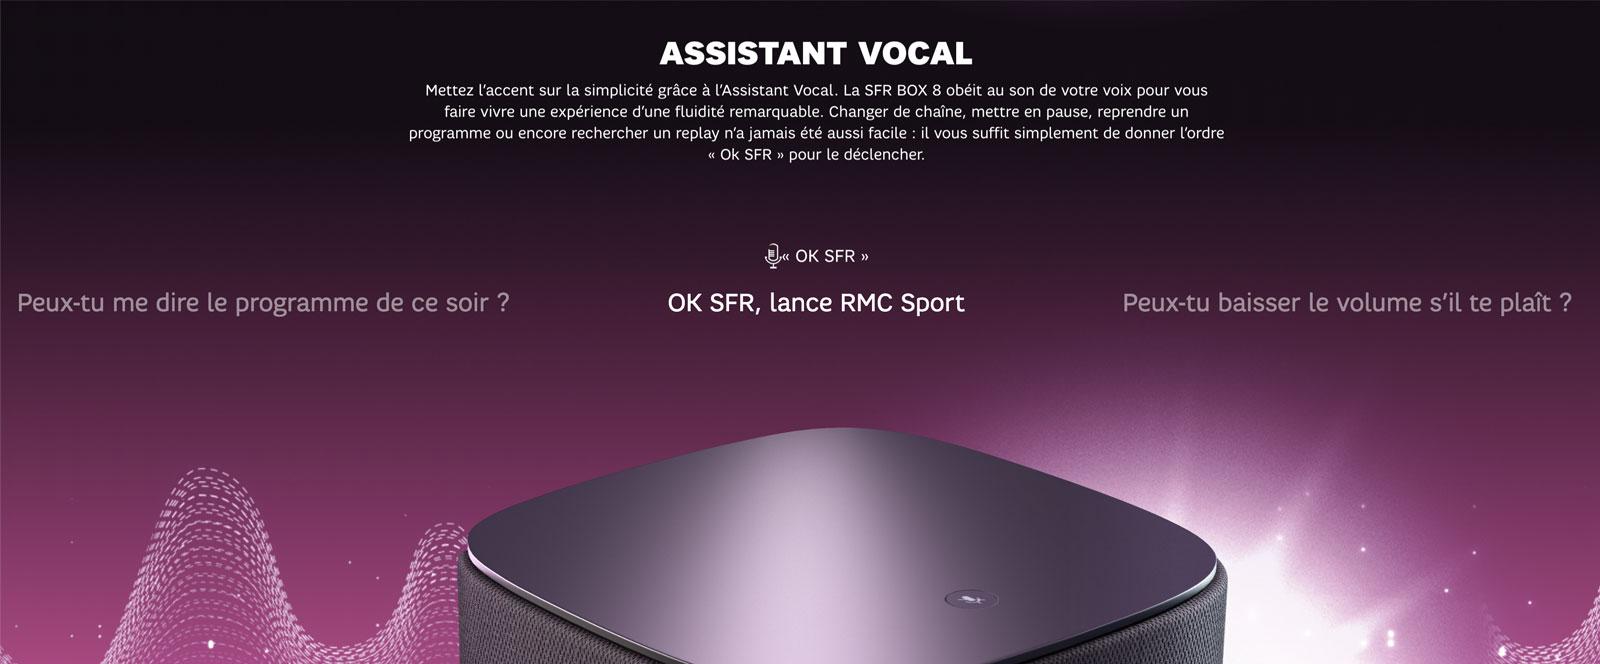 Assistant vocal SFR